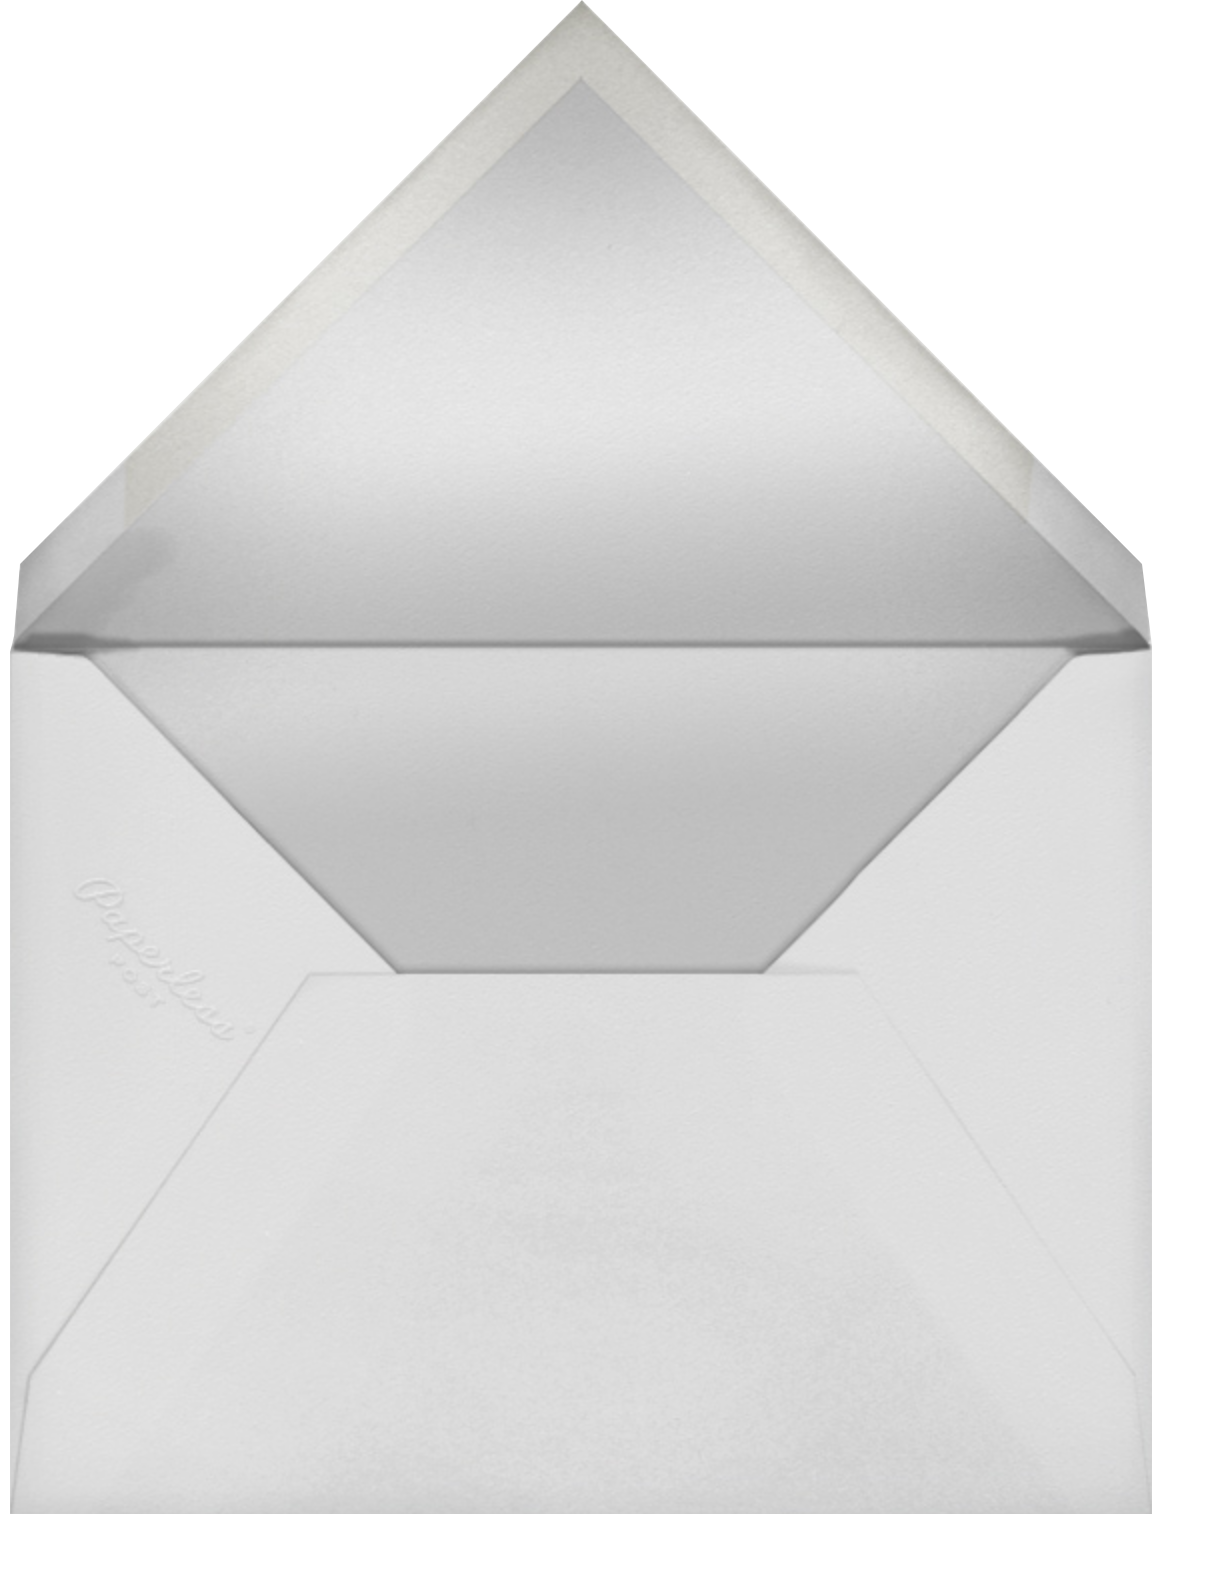 Vivid Florals (Program) - Rifle Paper Co. - Menus and programs - envelope back